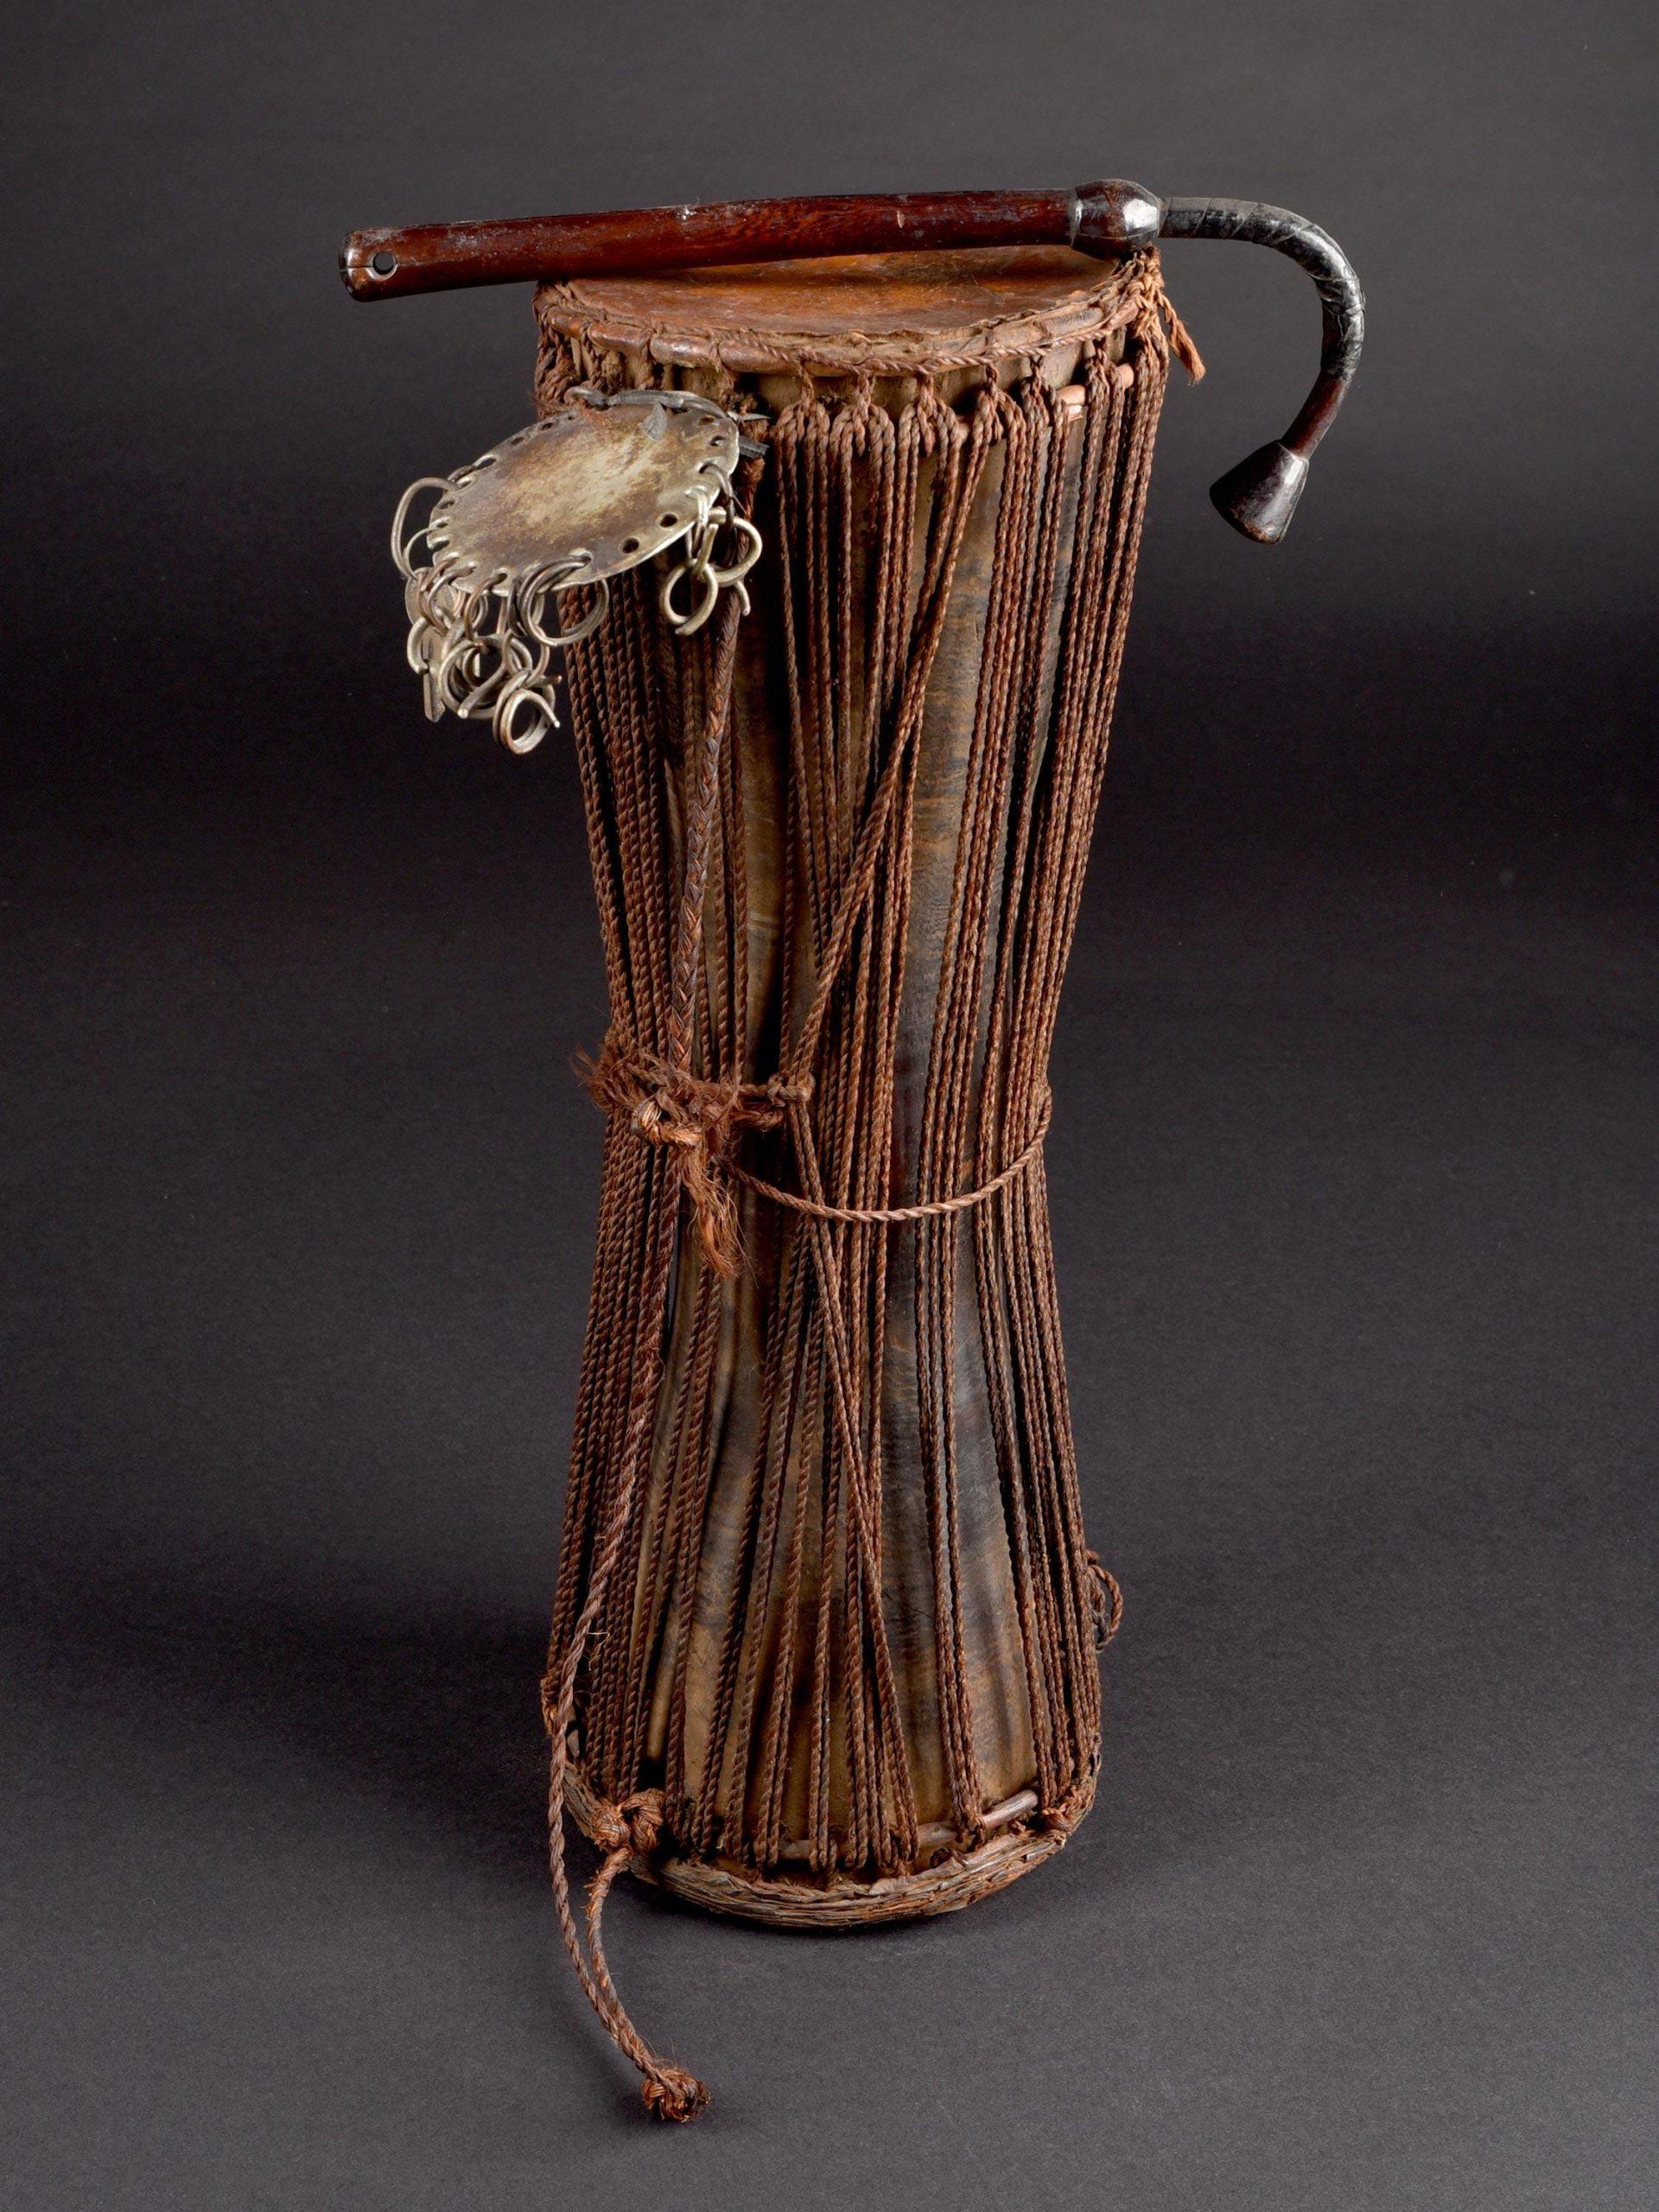 Yoruba talking drum